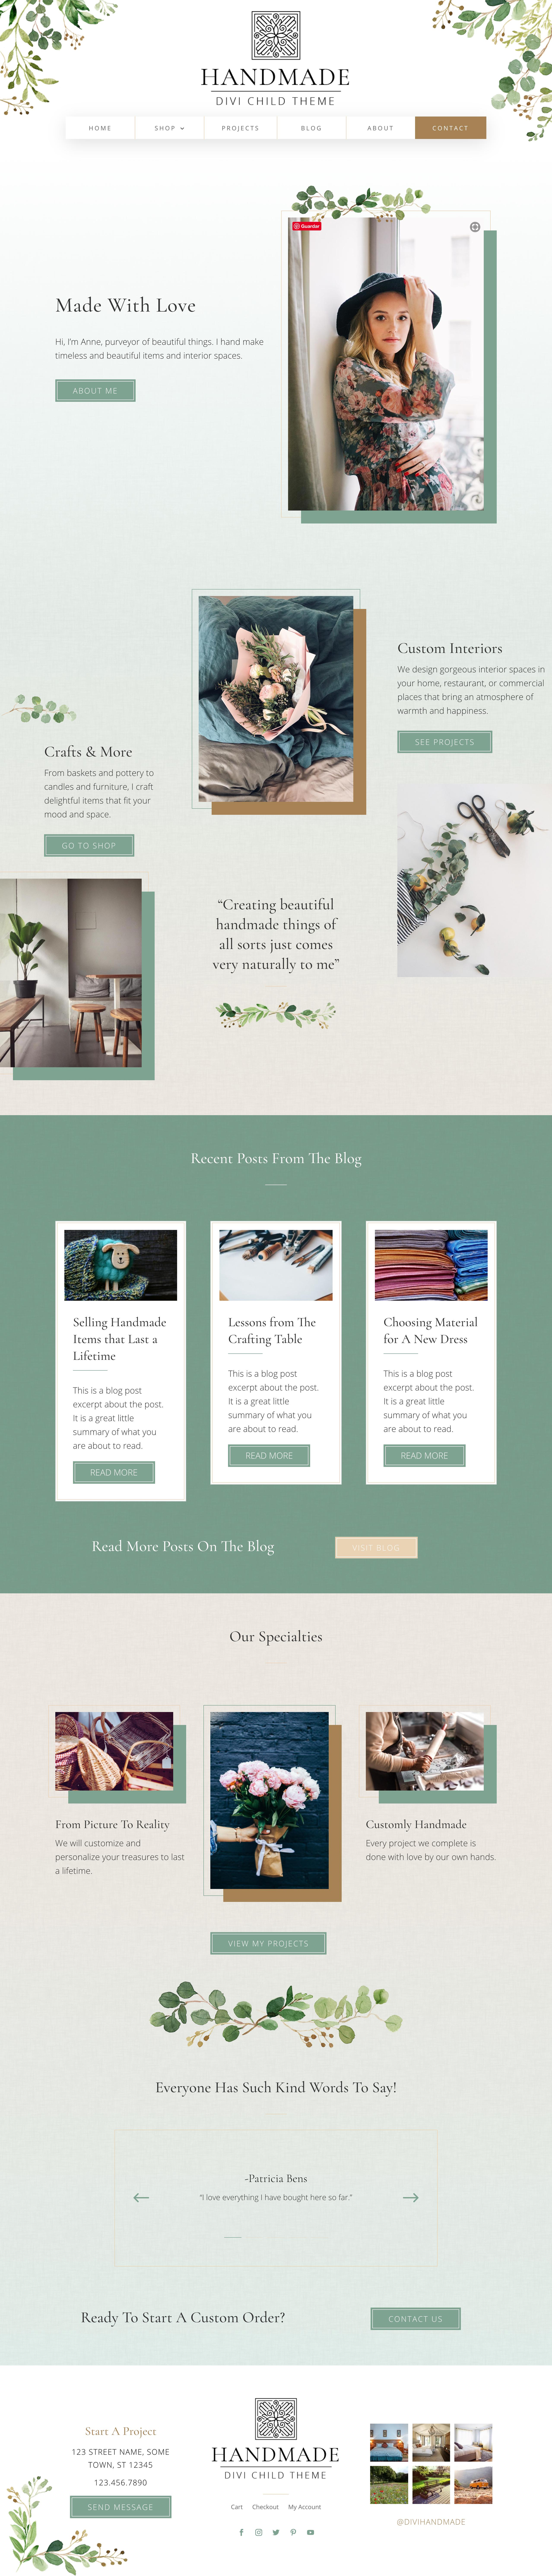 Pin On Design Web Design Inspiration Diseno Web